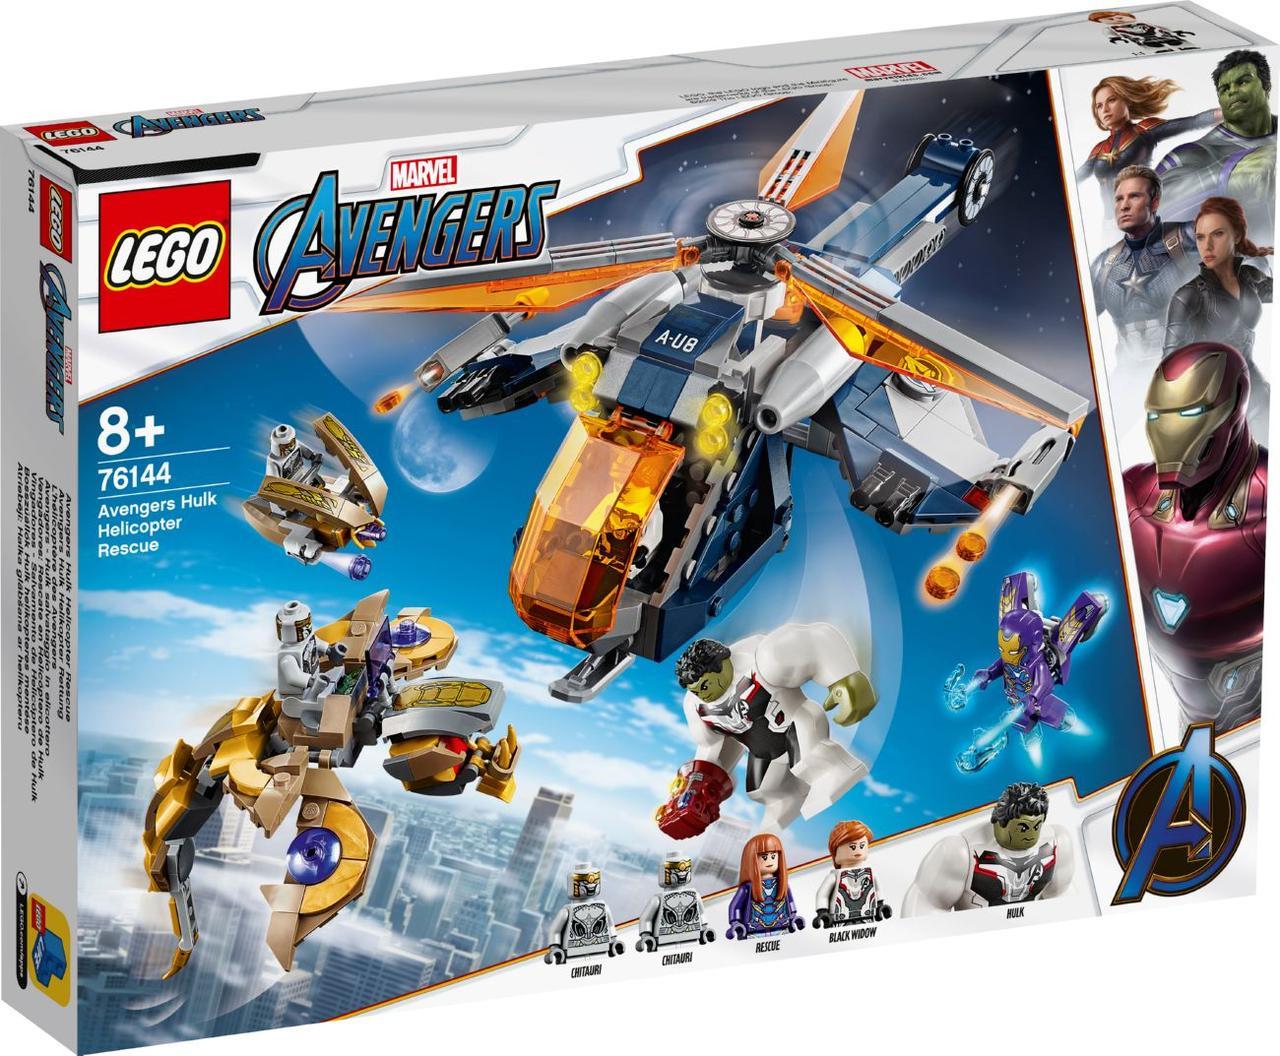 Lego Super Heroes Месники: Порятунок Халка на вертольоті 76144